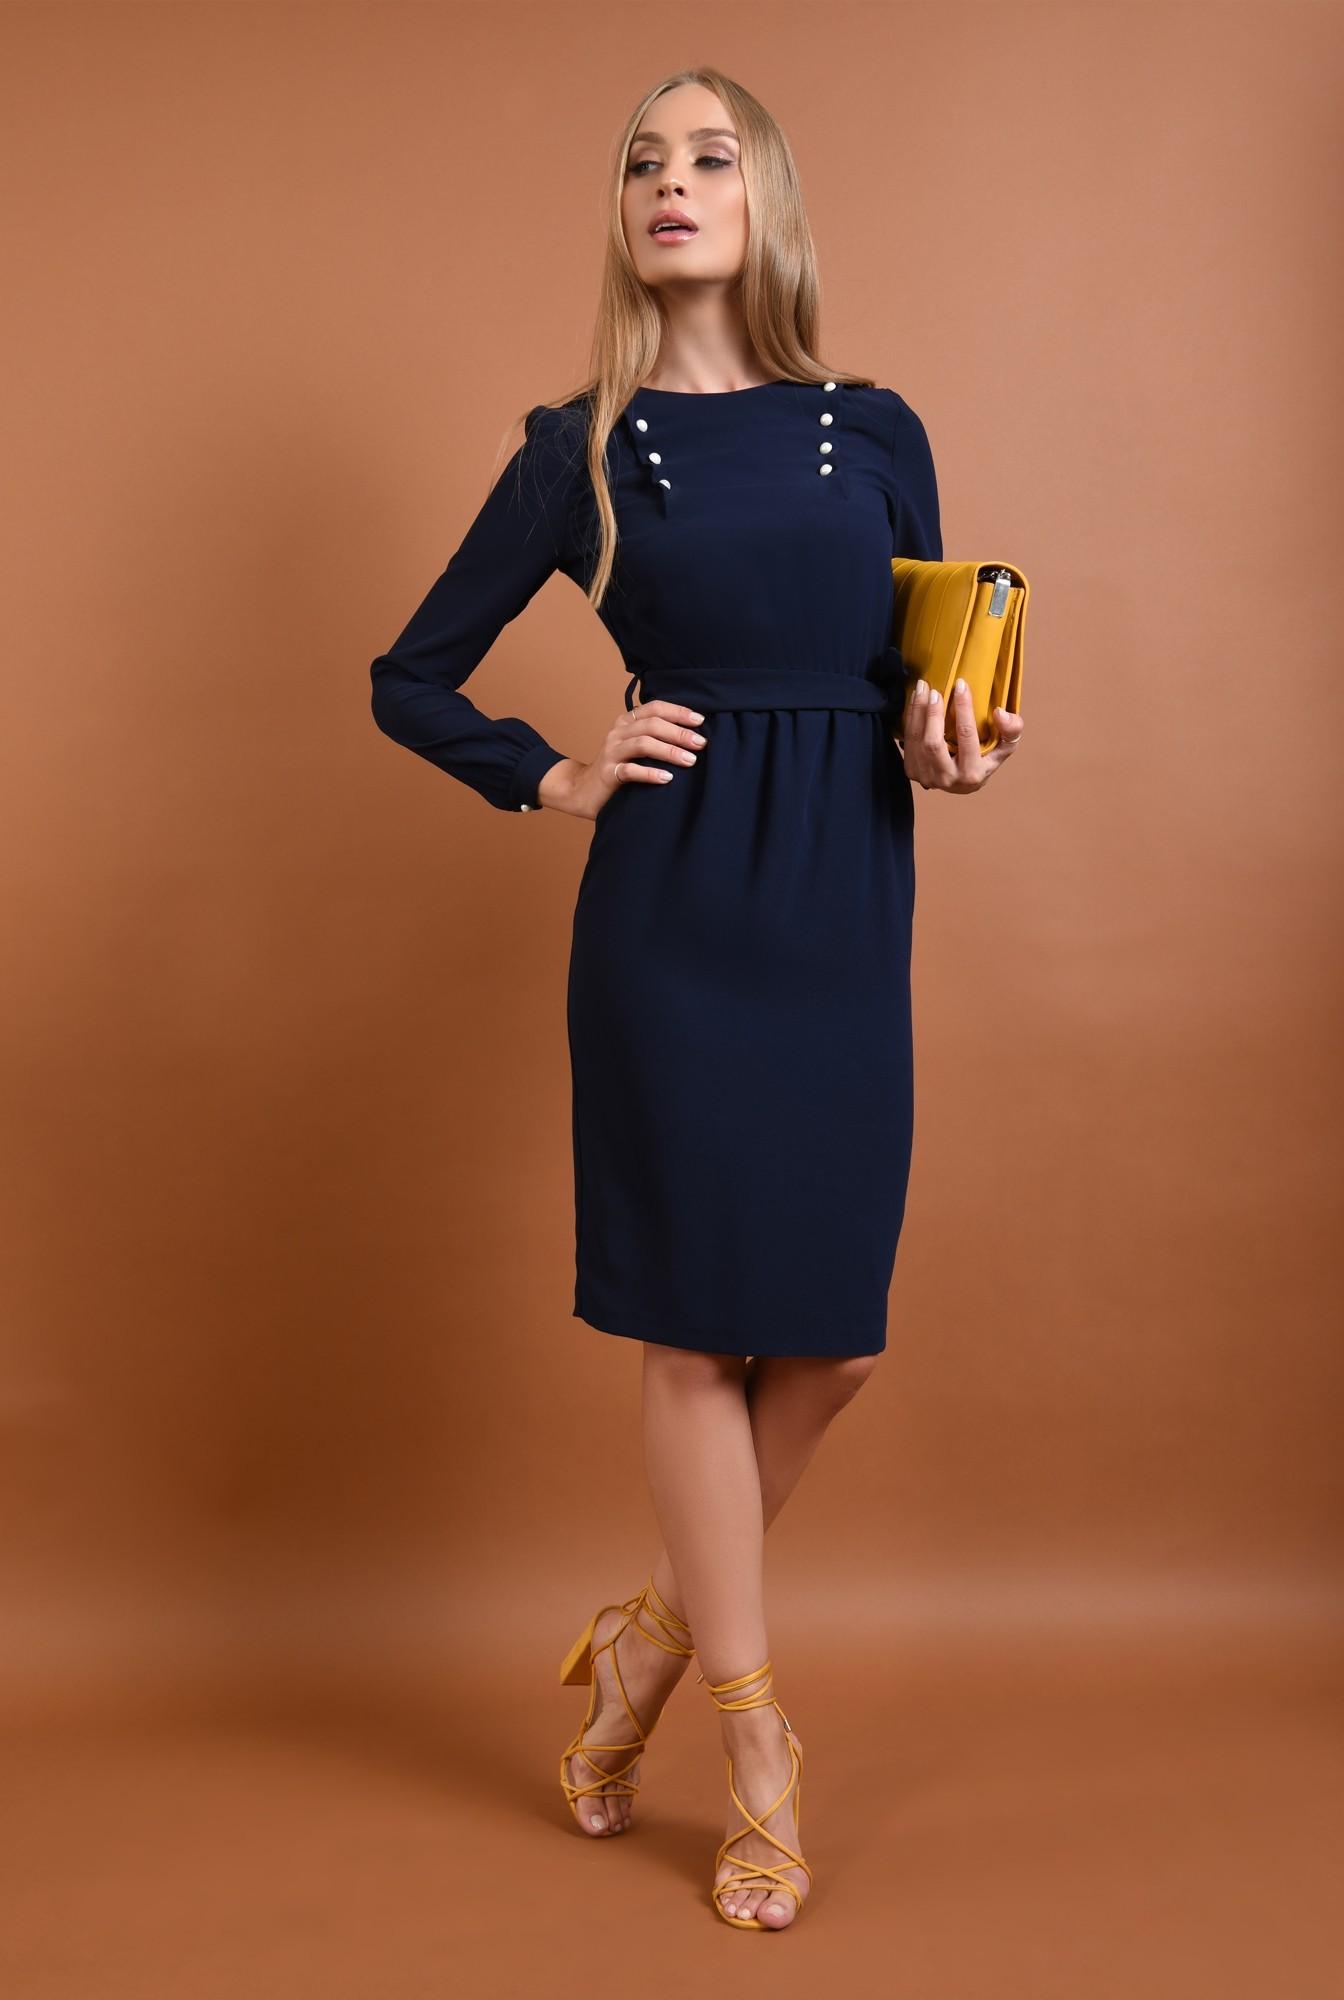 3 - rochie de zi, midi, albastru, bleumarin, maneci lungi, mansete